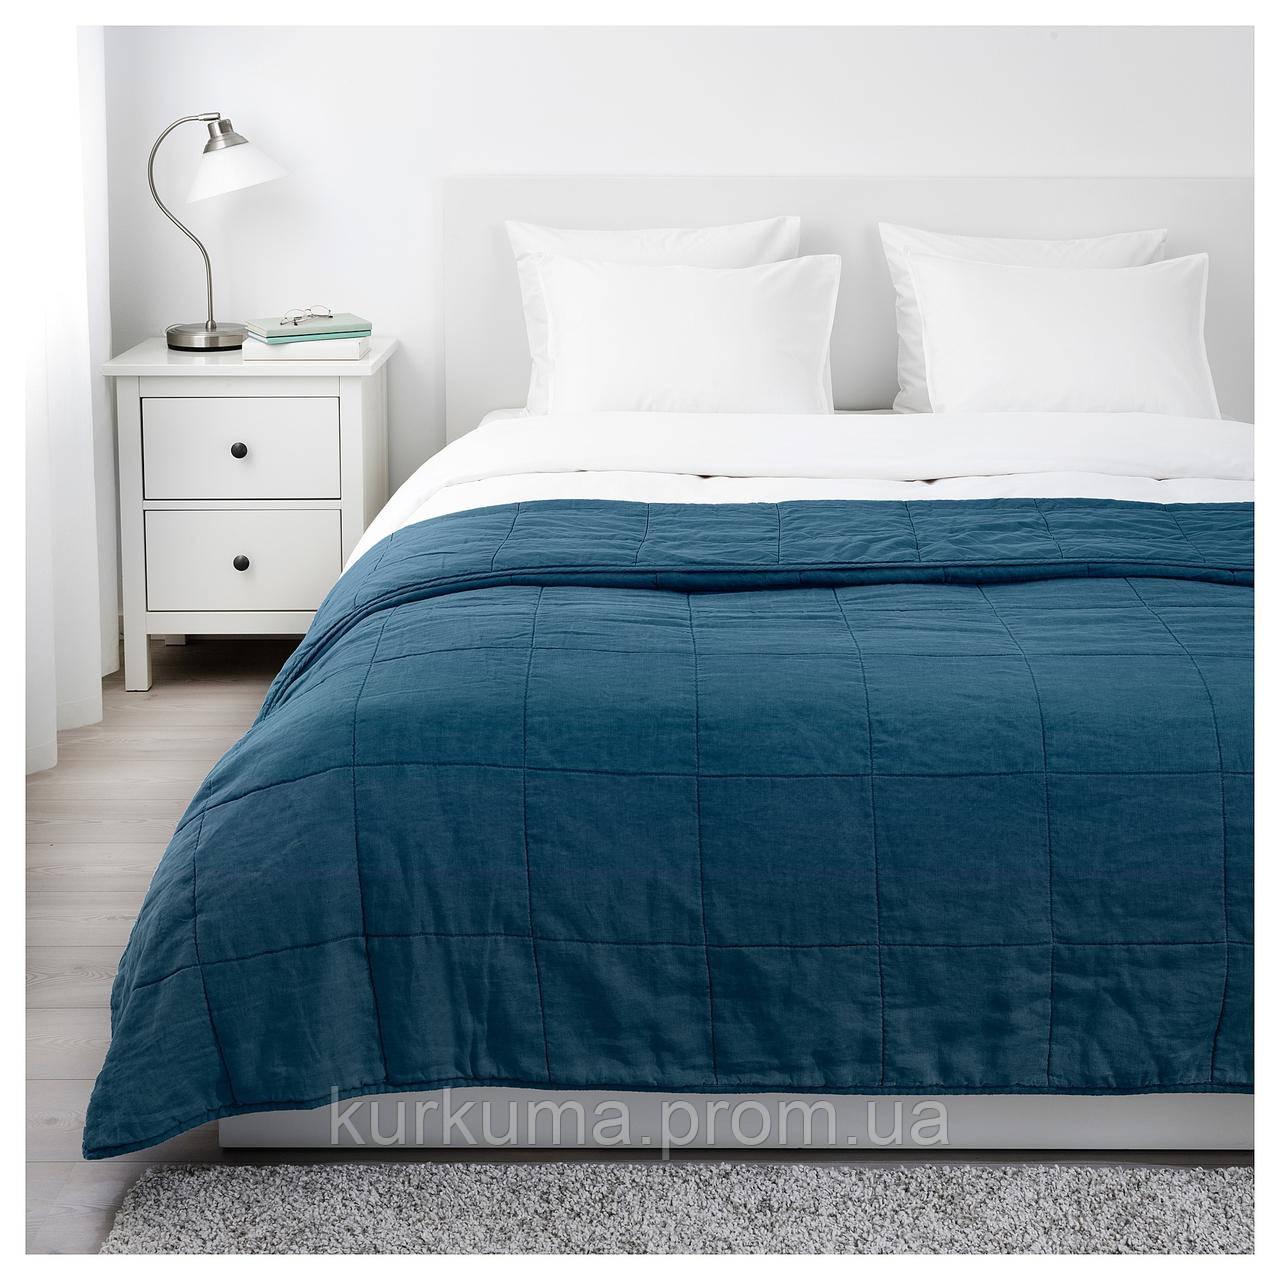 IKEA GULVED Покрывало, темно-синий  (503.929.01)